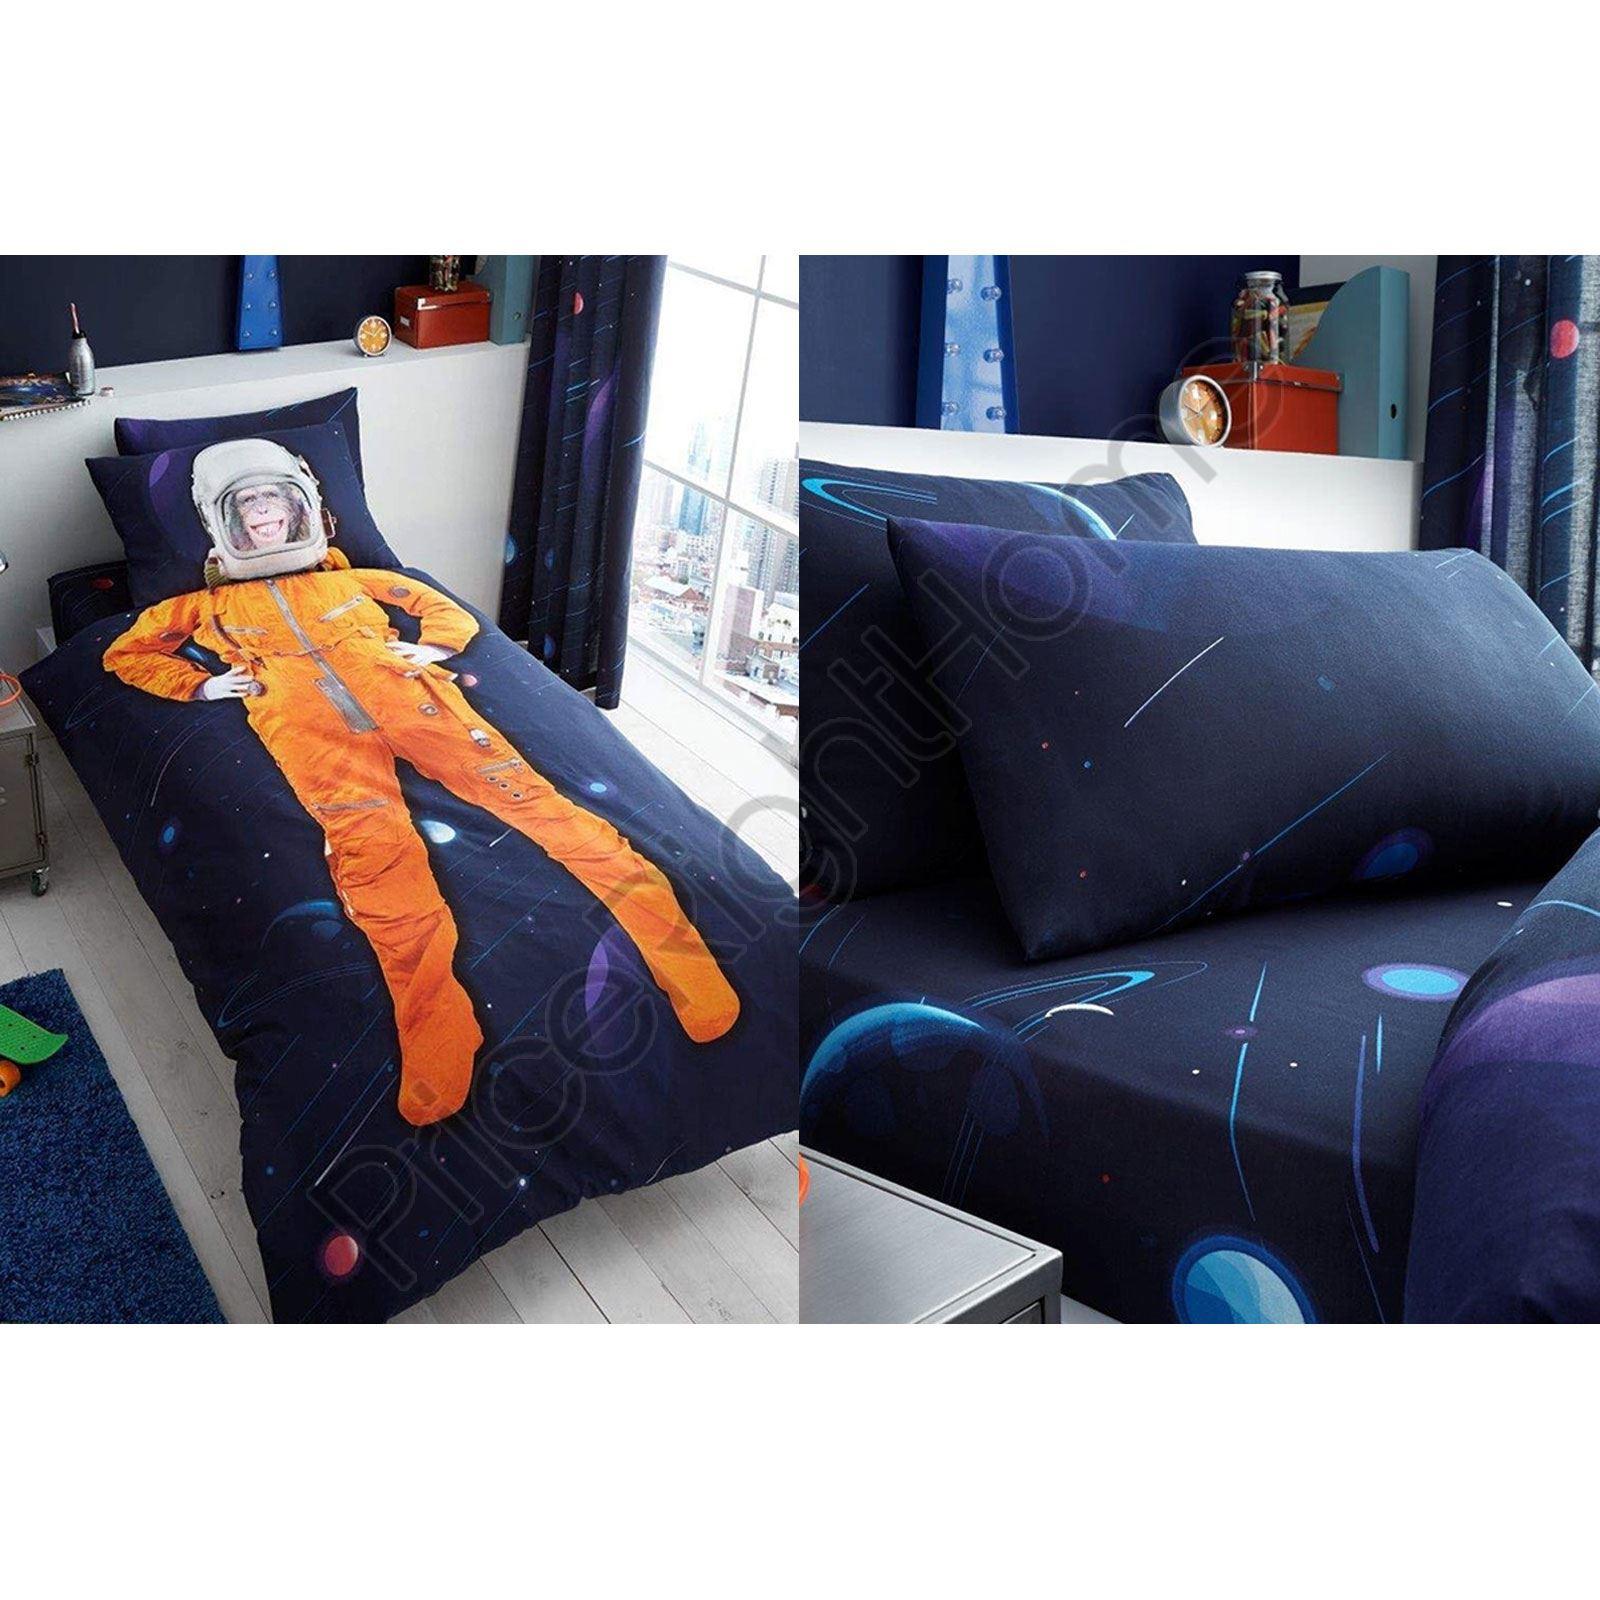 Indexbild 5 - SPACE CHIMP BEDDING - SINGLE DUVET, FITTED SHEET KIDS BEDROOM ASTRONAUT